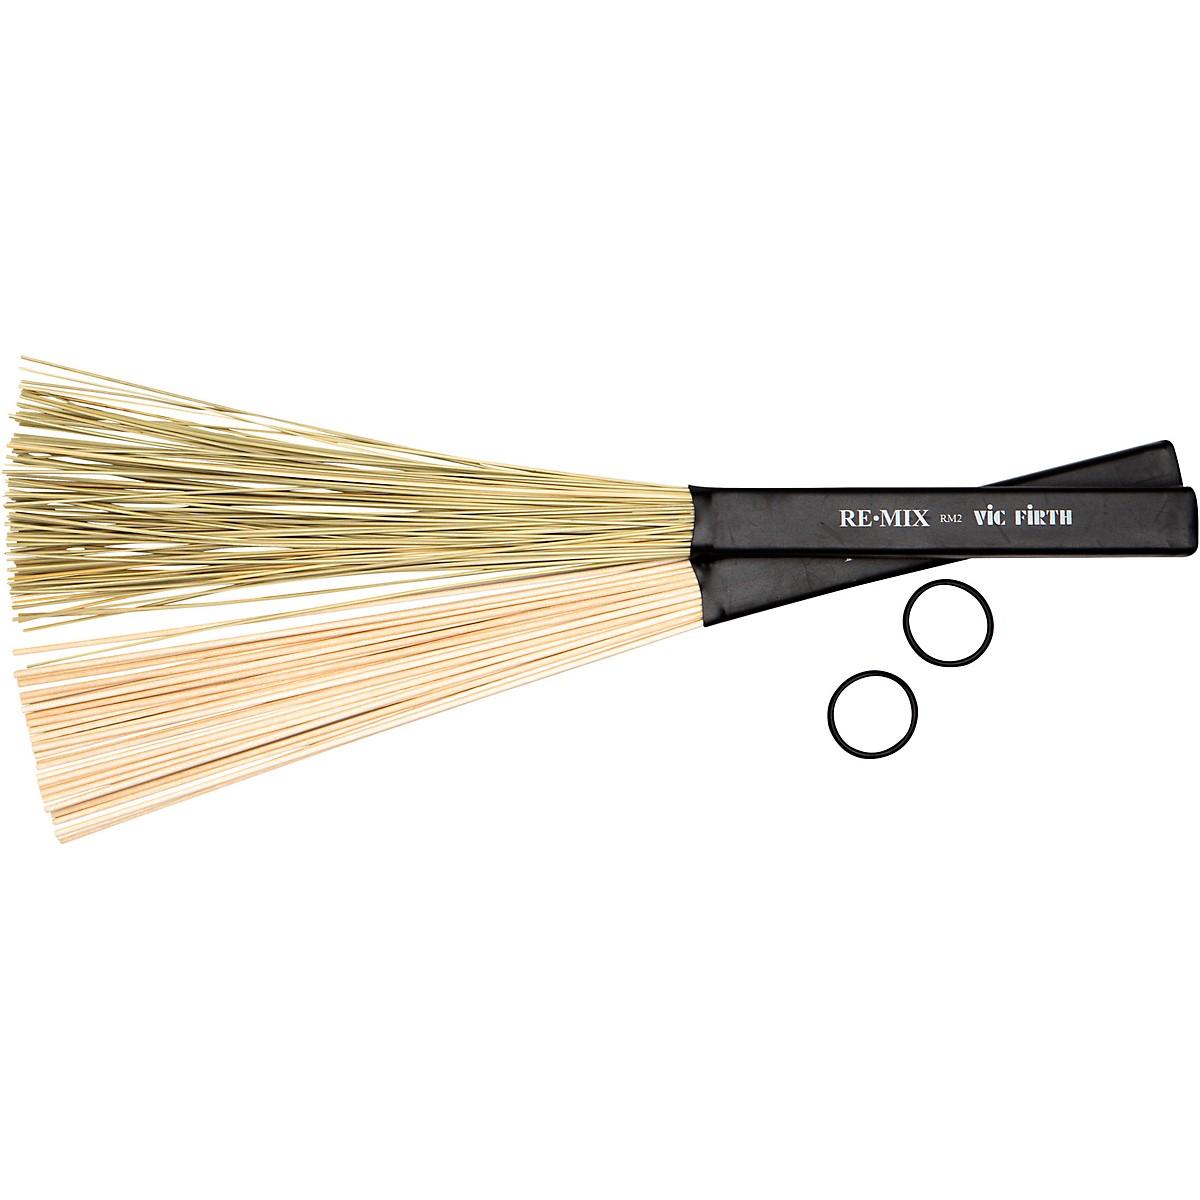 Vic Firth Remix Brush Pack